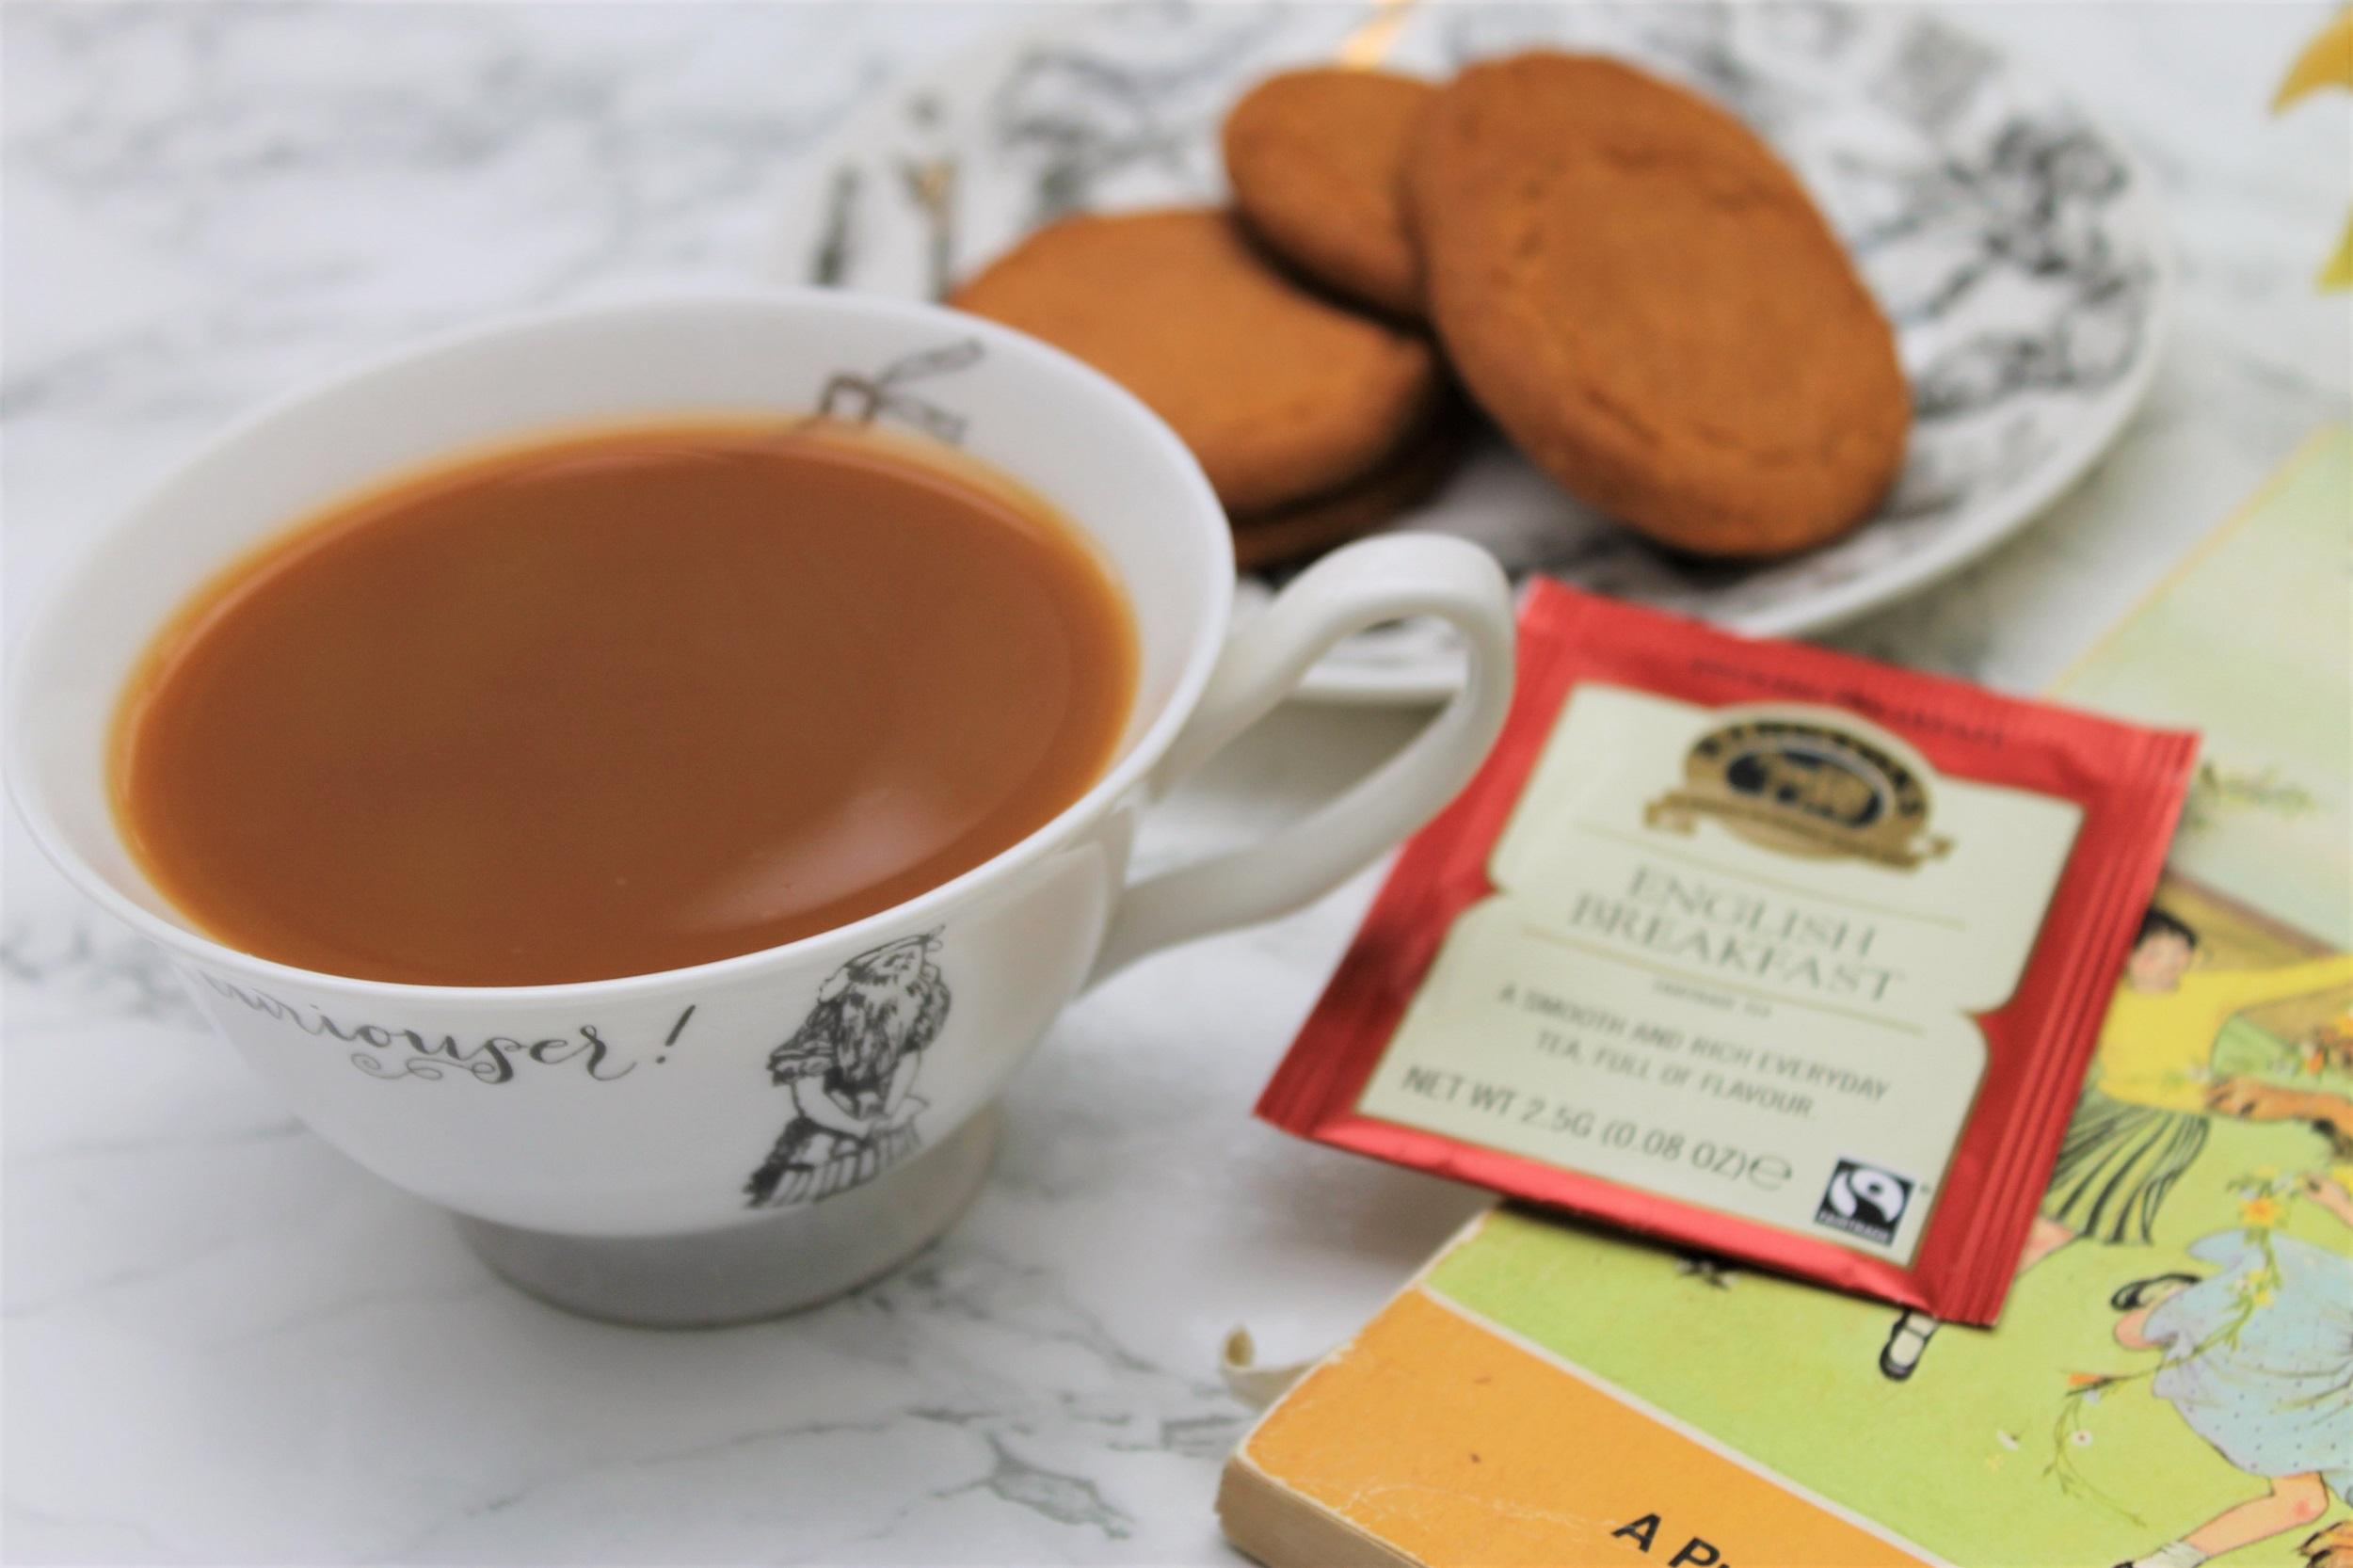 ringtons english breakfast tea in teacup